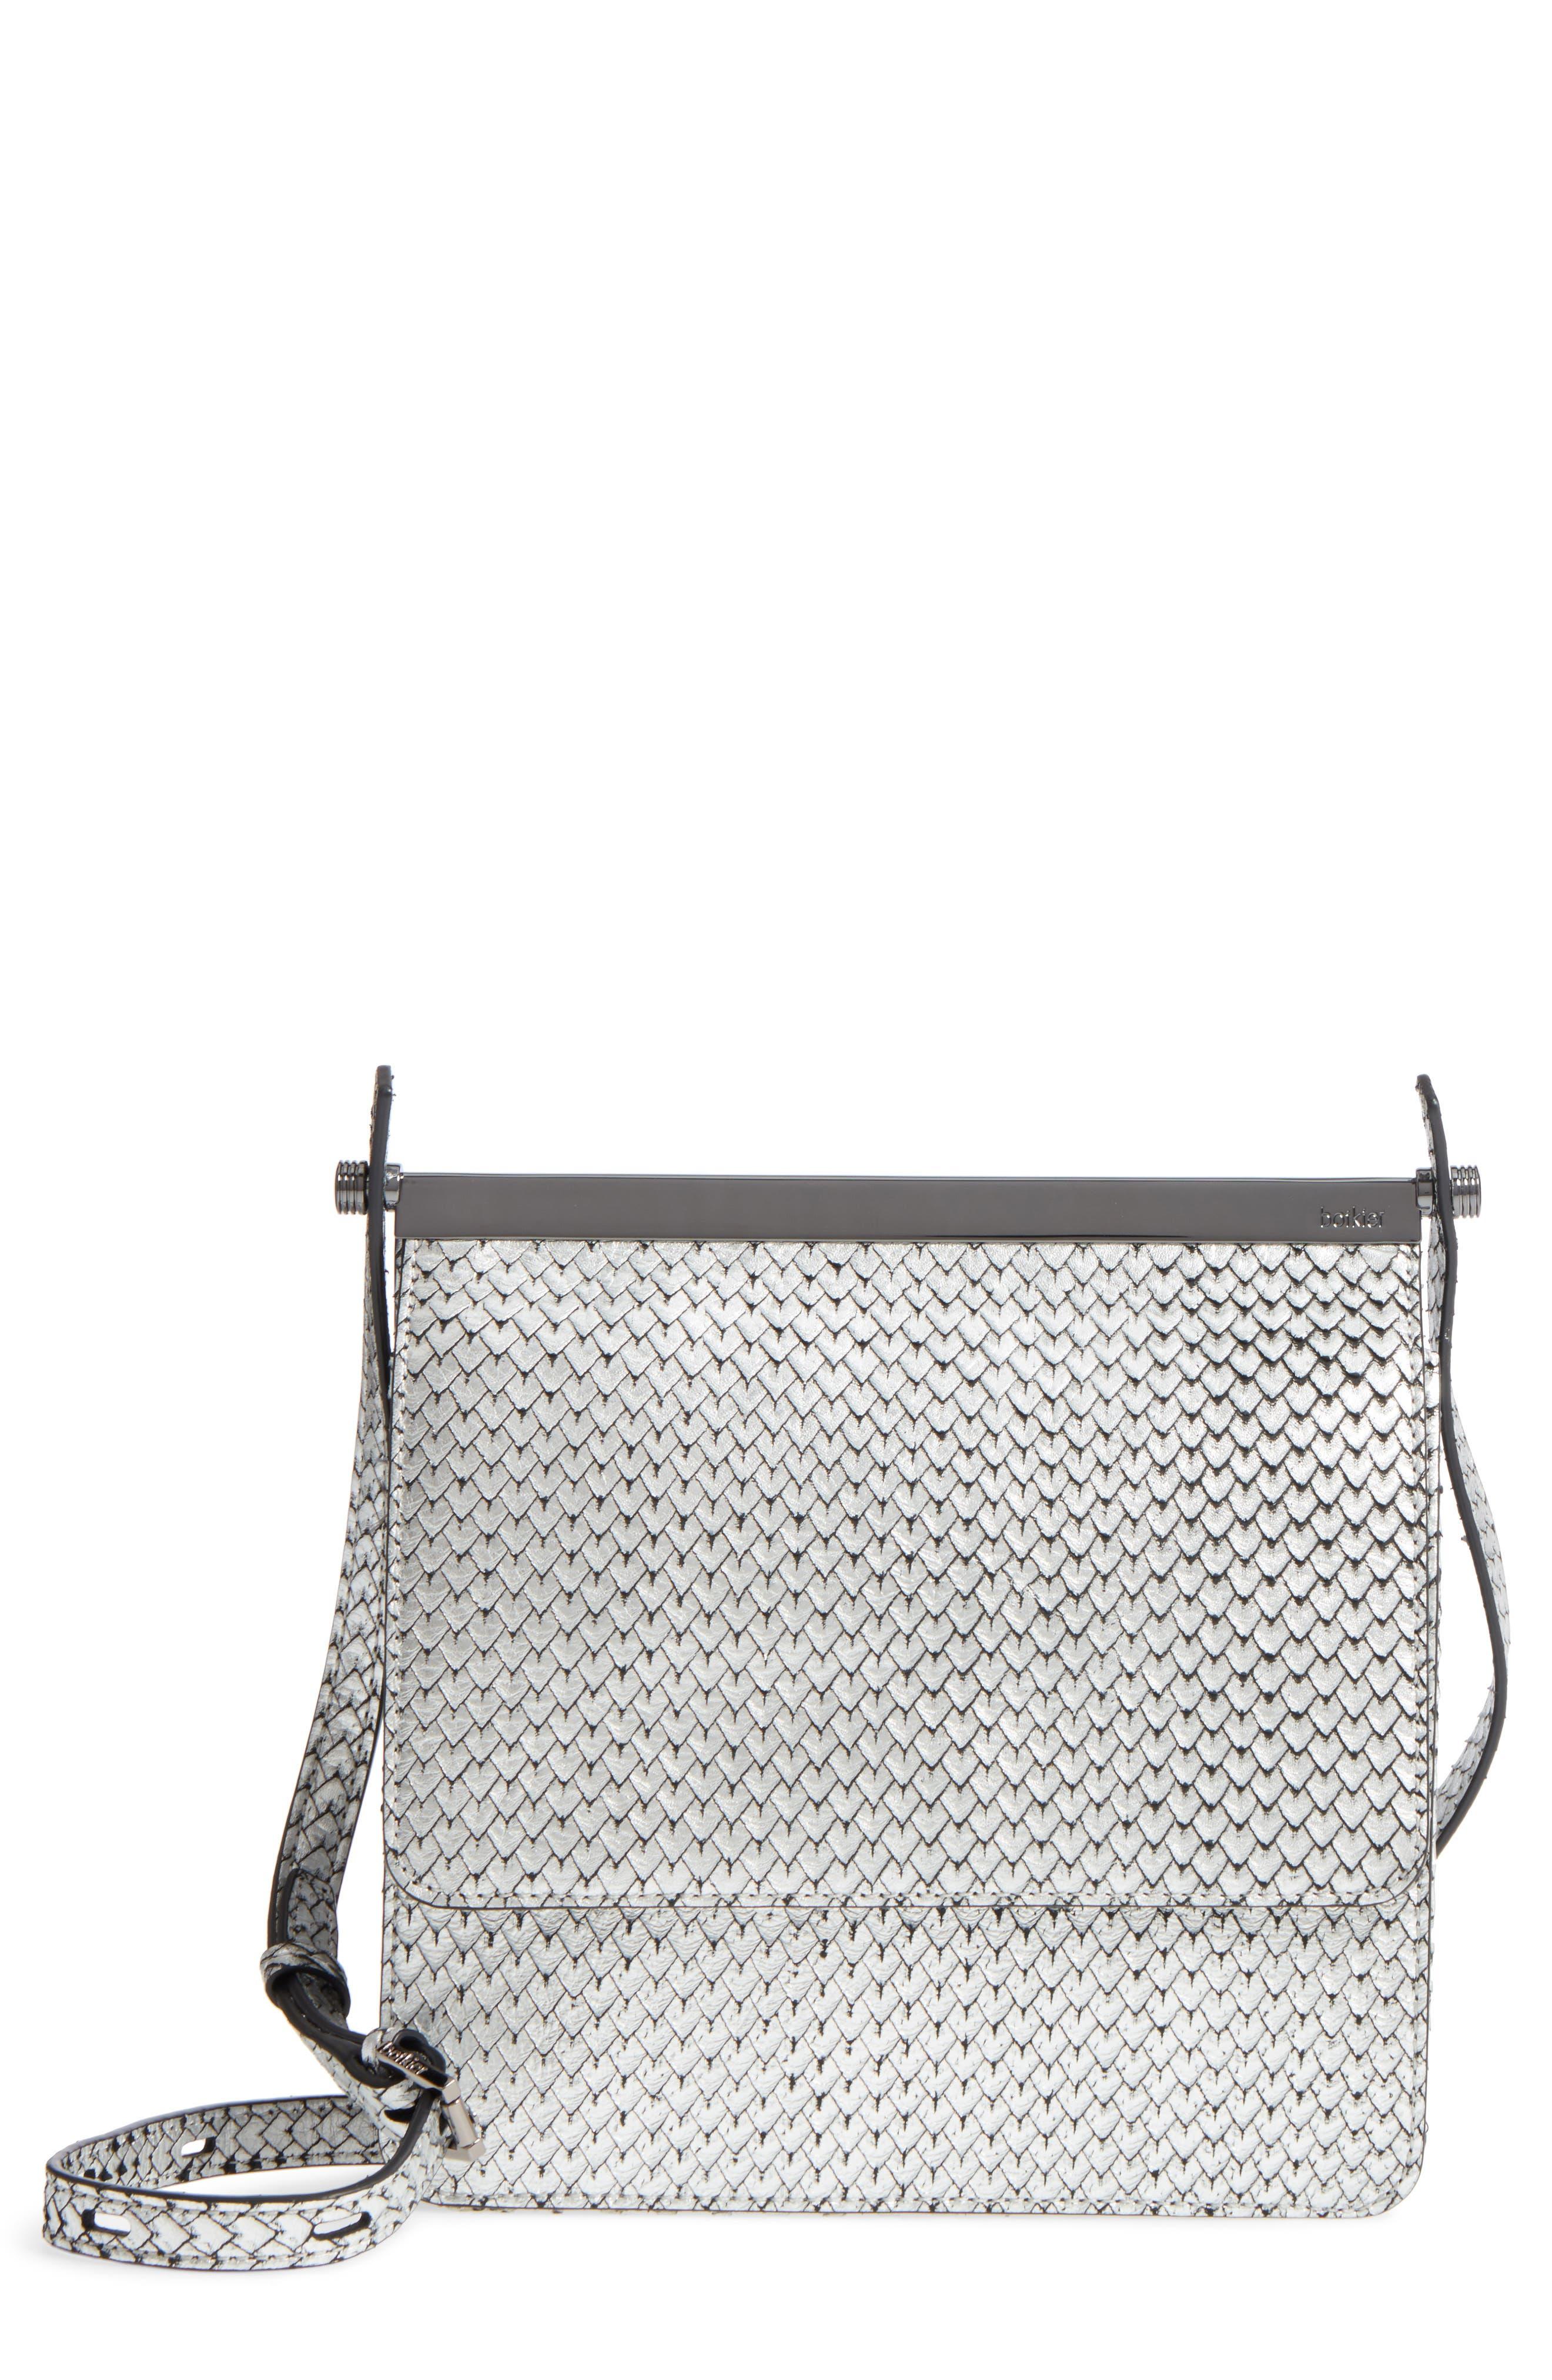 Main Image - Botkier Crawford Calfskin Leather Crossbody Bag